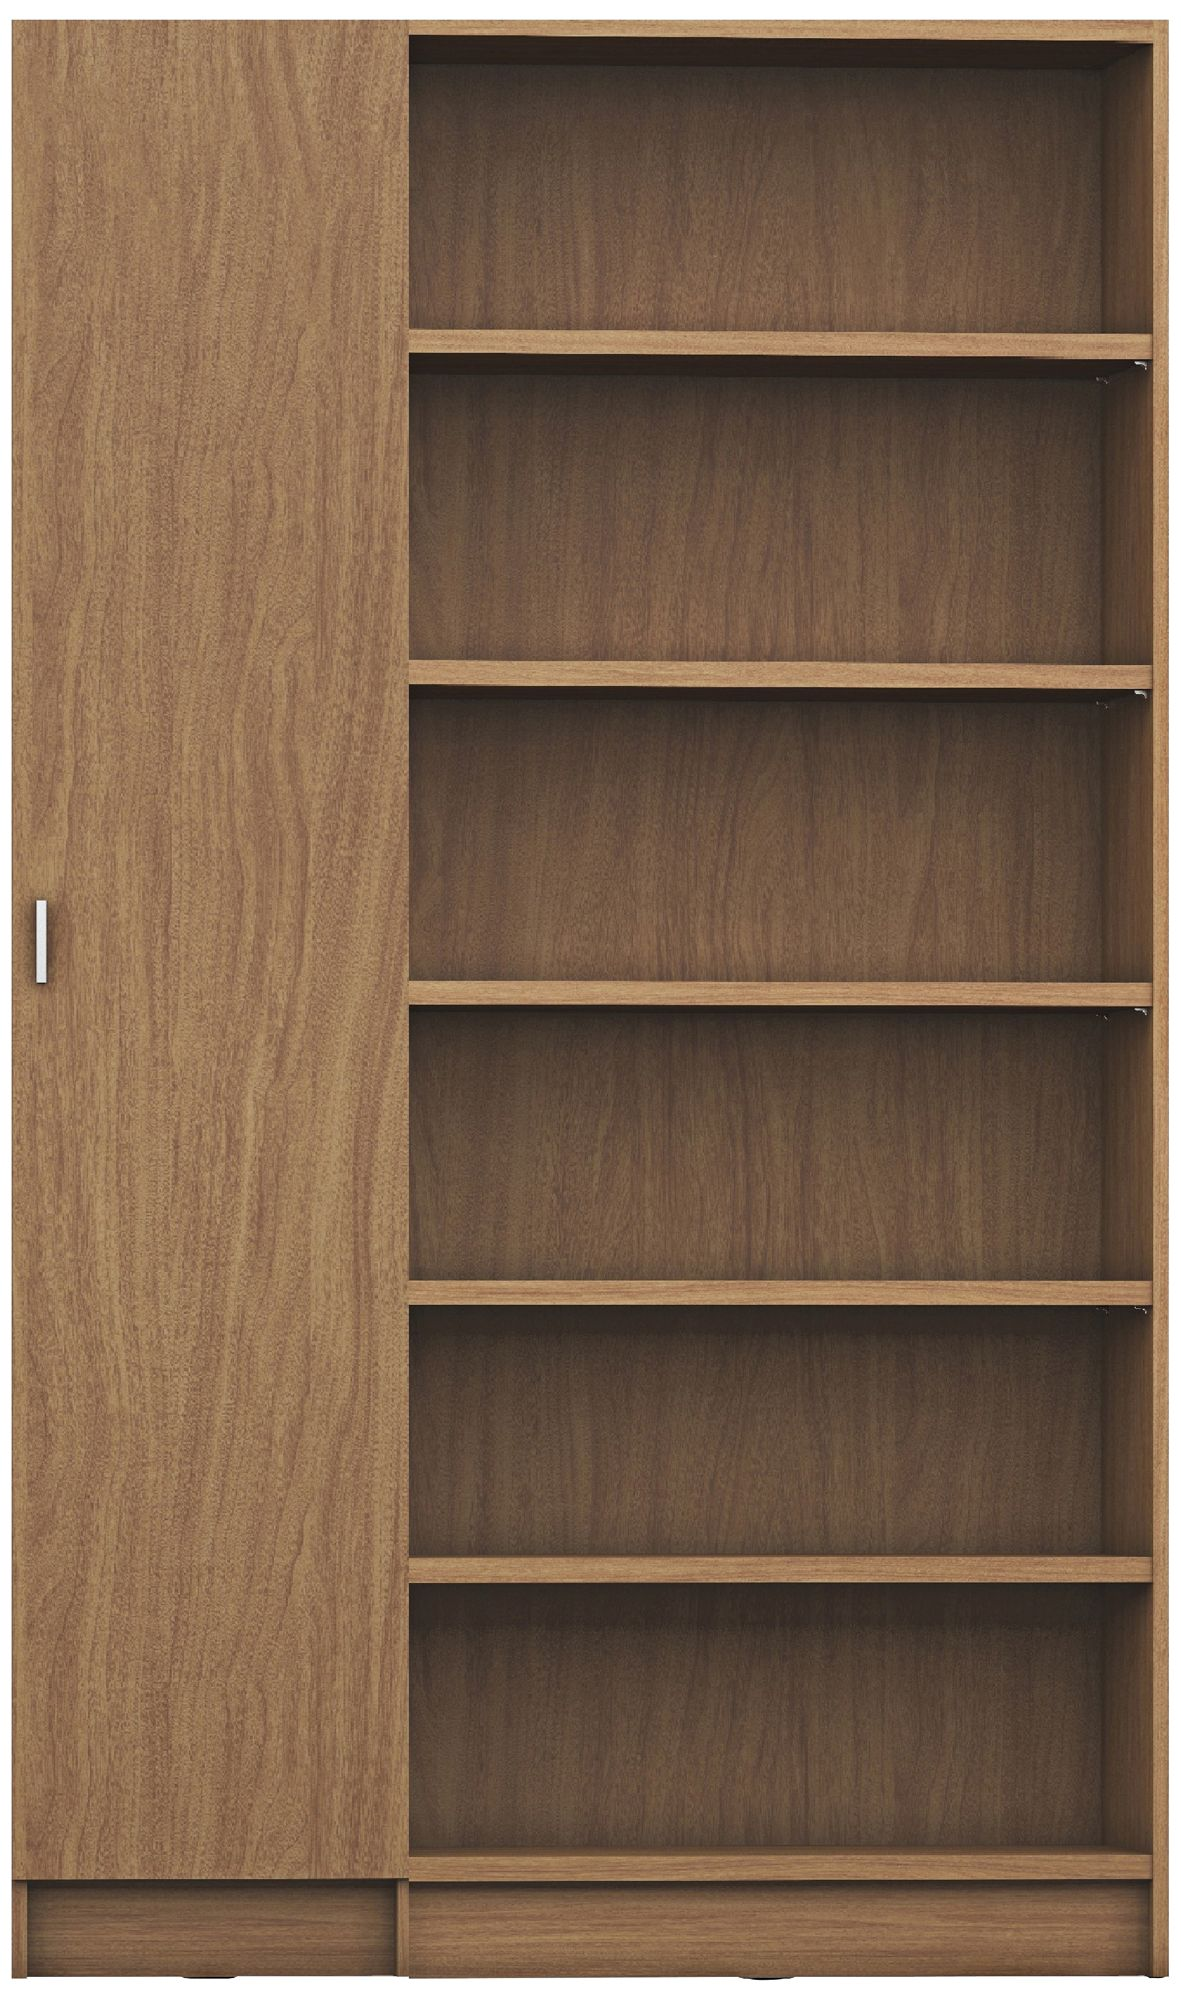 Greenwich Venti Maple Cream 1-Door Narrow Bookcase  sc 1 st  L&s Plus & Greenwich Venti Maple Cream 1-Door Narrow Bookcase - #38H13 | Lamps Plus